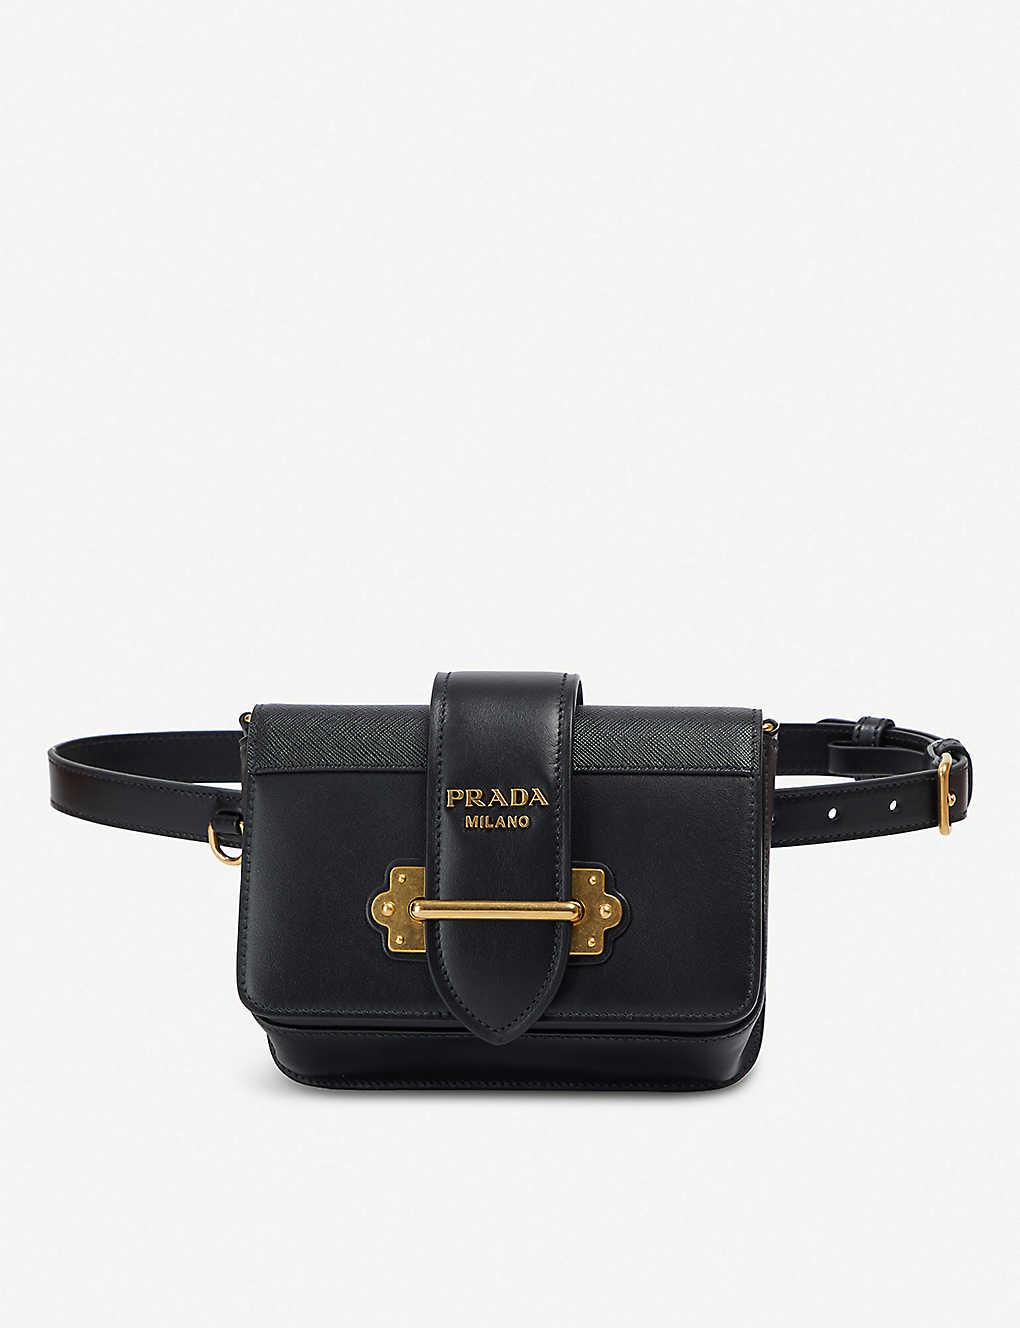 9c140d9f6b49c PRADA - Cahier logo-plaque leather belt bag   Selfridges.com